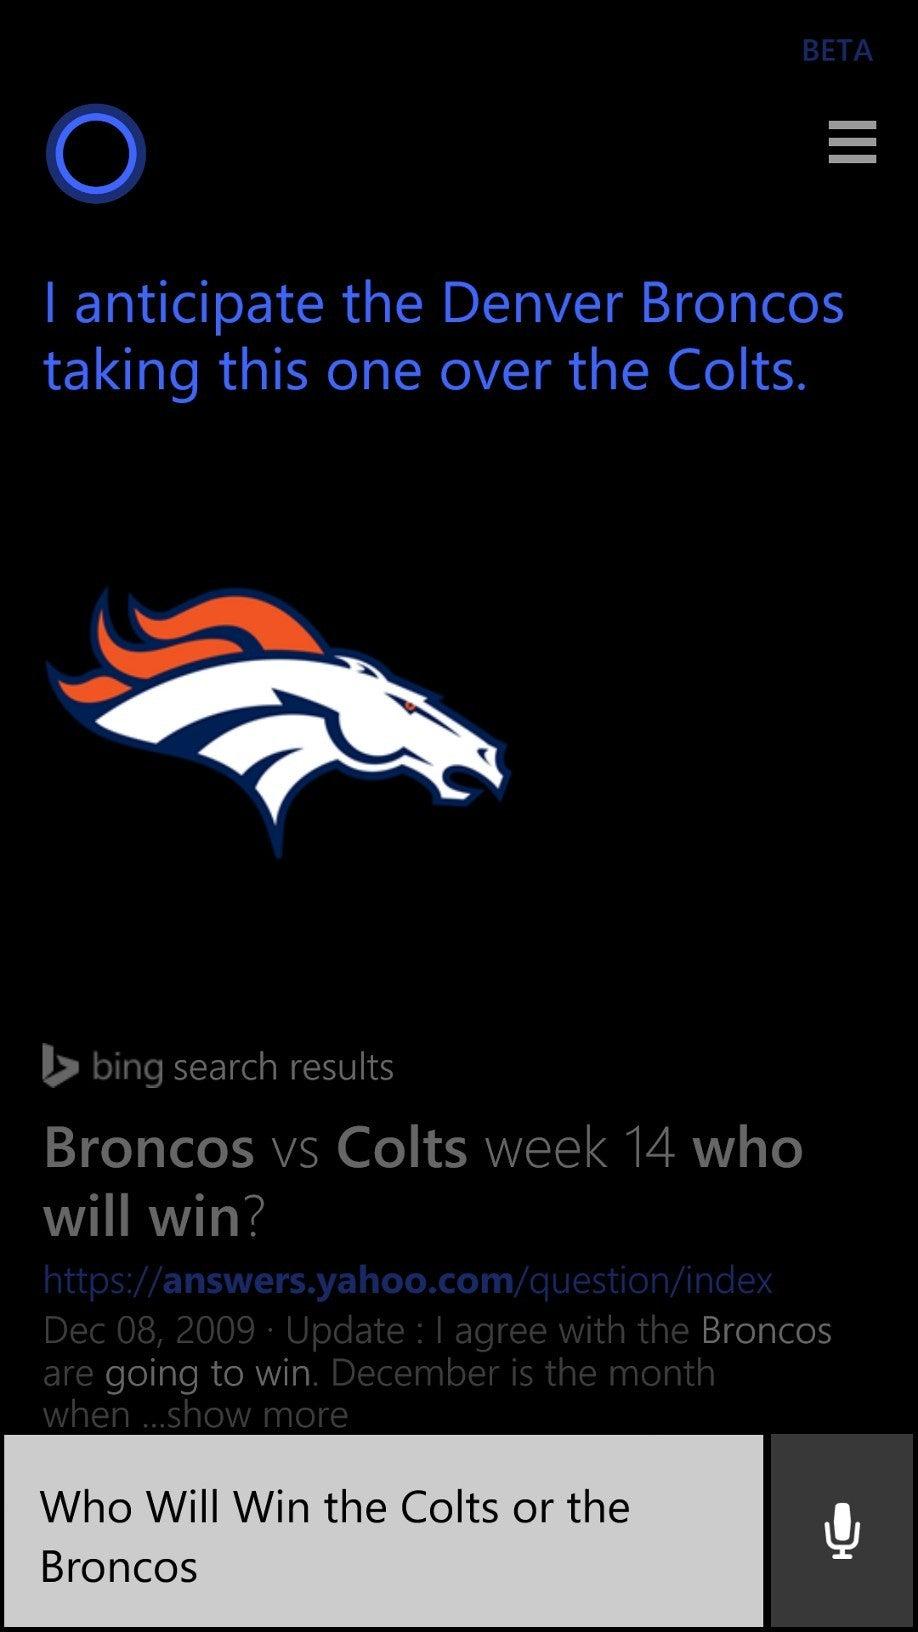 Microsoft's Cortana now picks NFL football winners, too | PCWorld